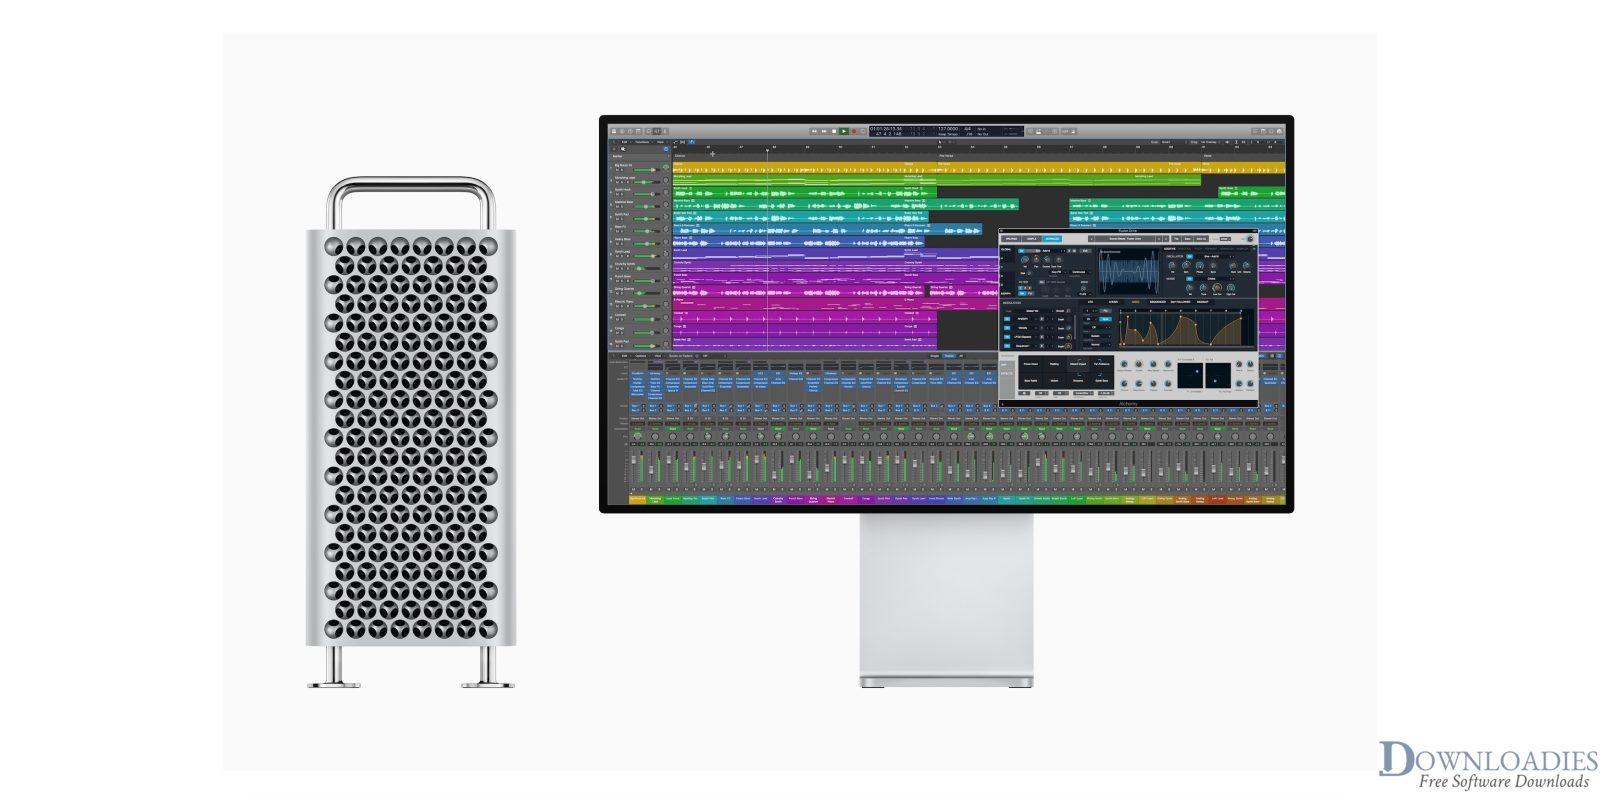 Apple Logic Pro X 10.4.5 for Mac free download @downloadies.com